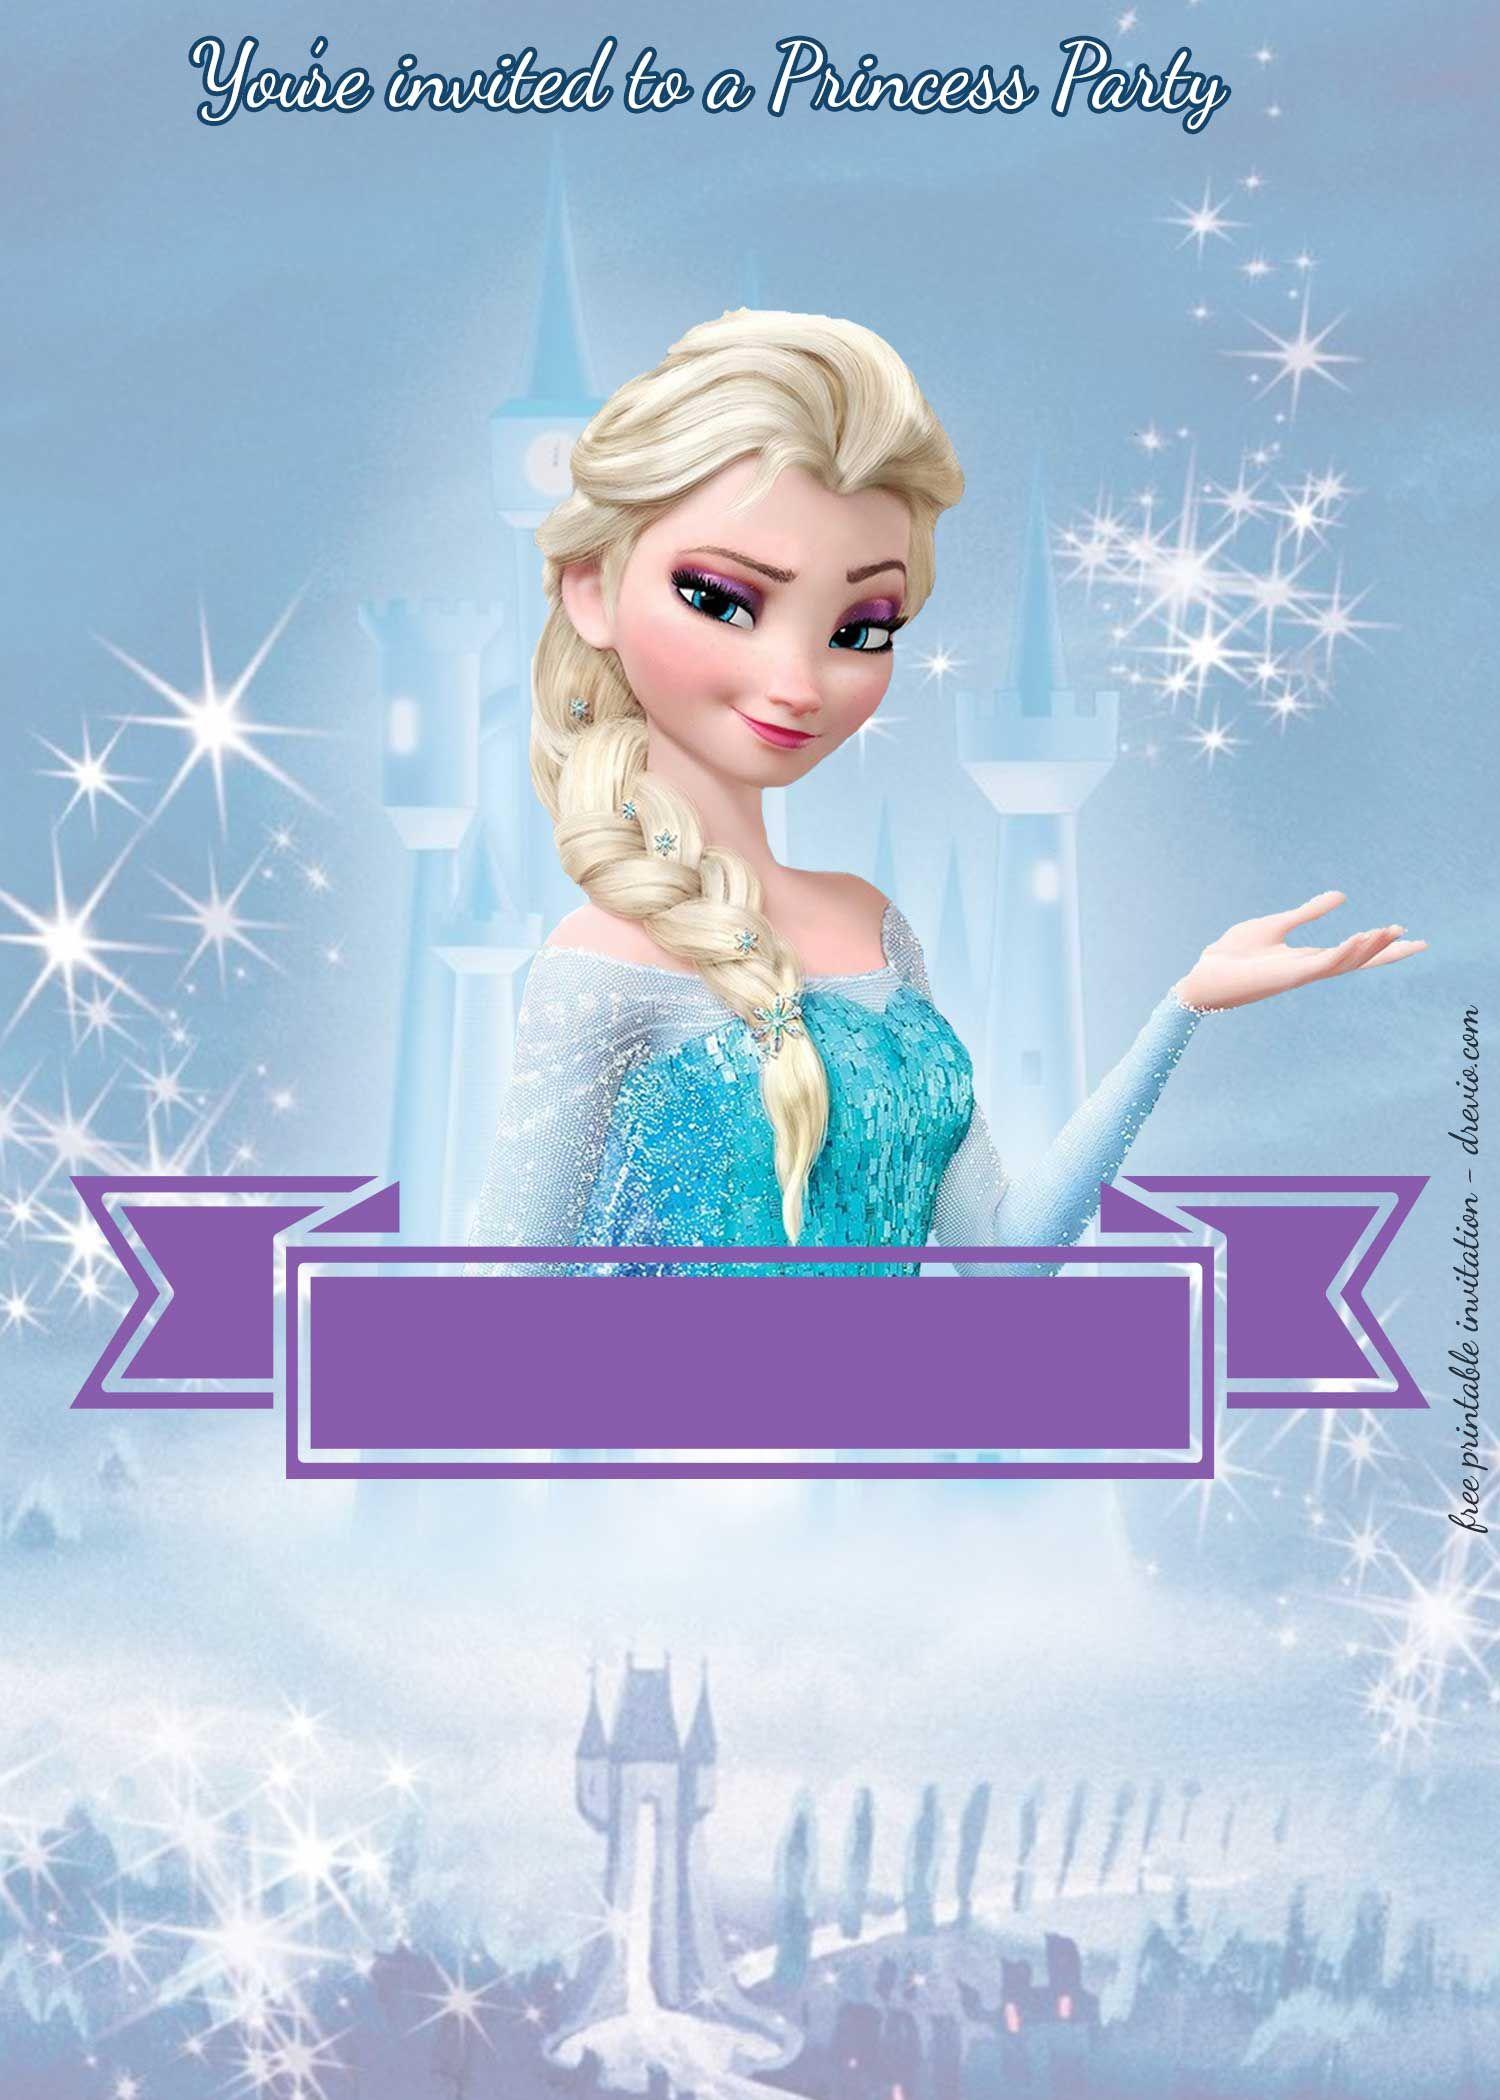 free princess party birthday invitation templates lidia